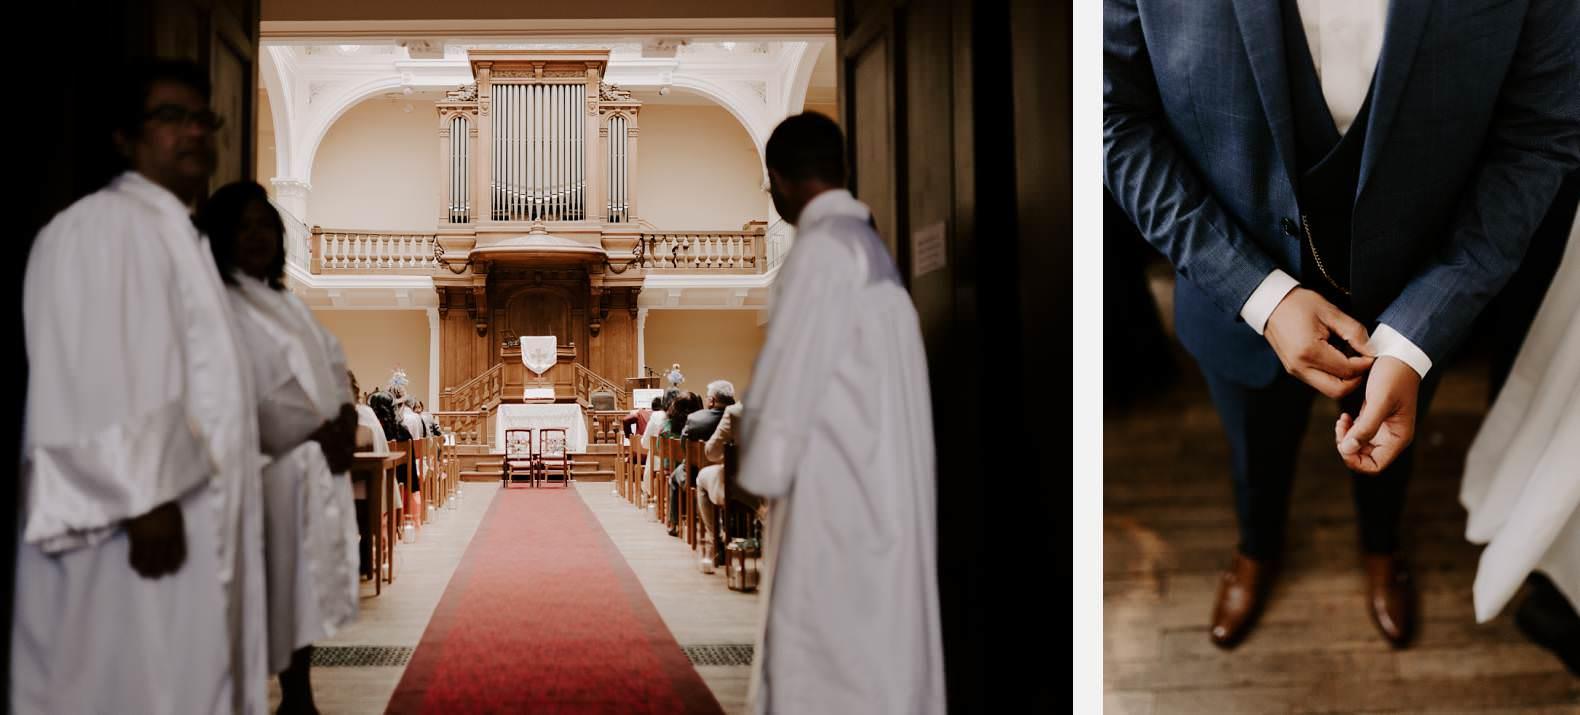 mariage manoir de corny photographe bel esprit 0016 1